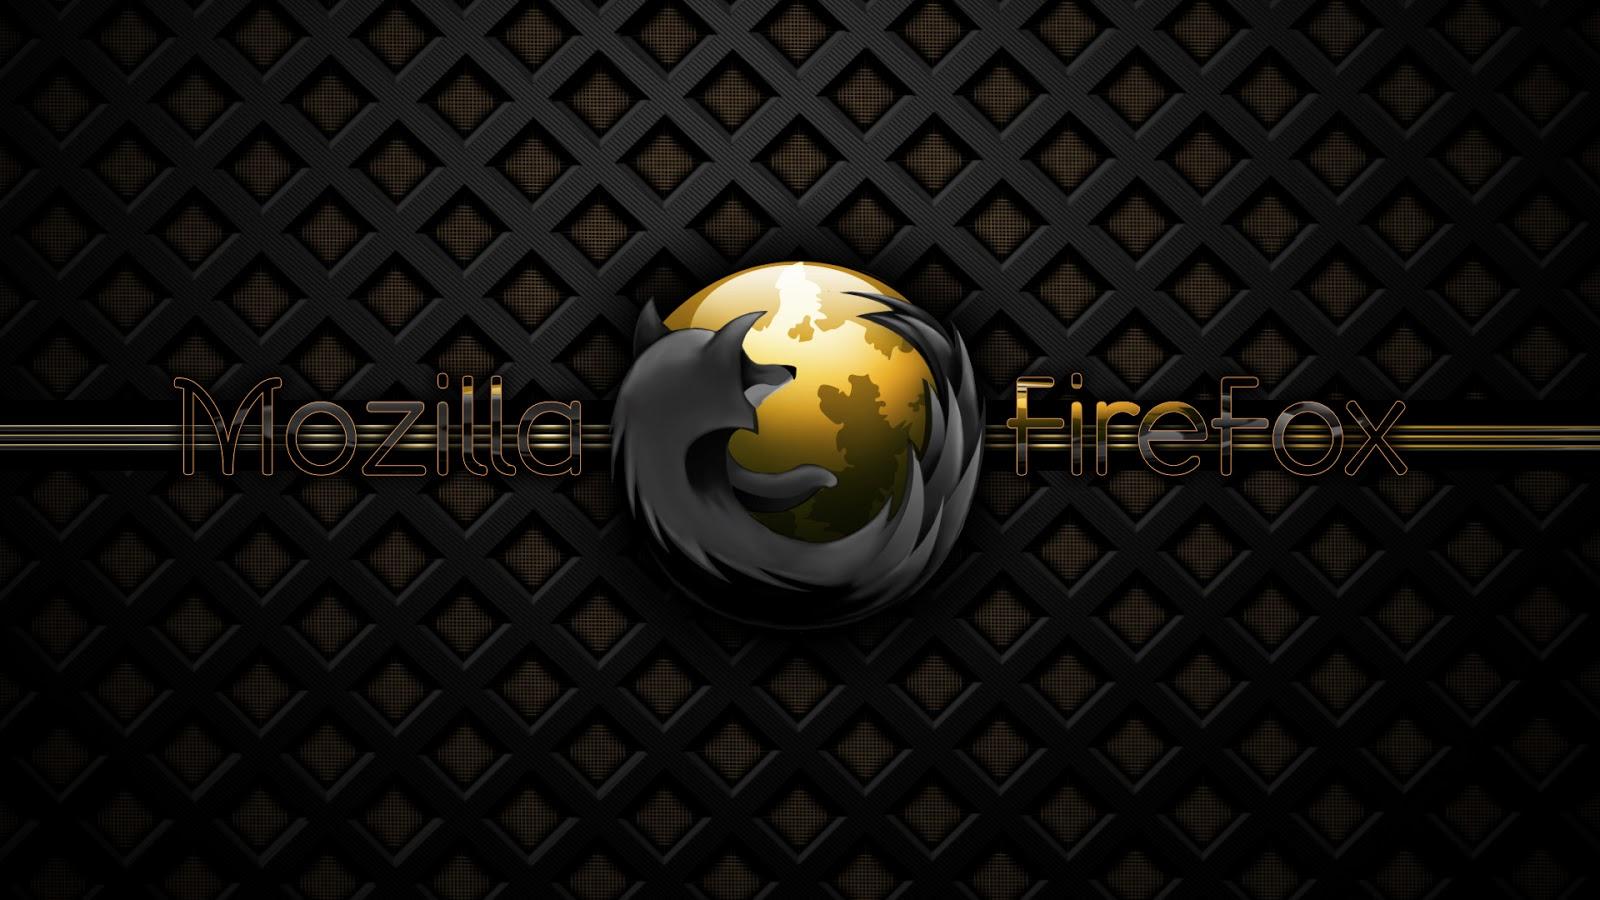 Best 7 Mozilla Firefox Wallpaper Download